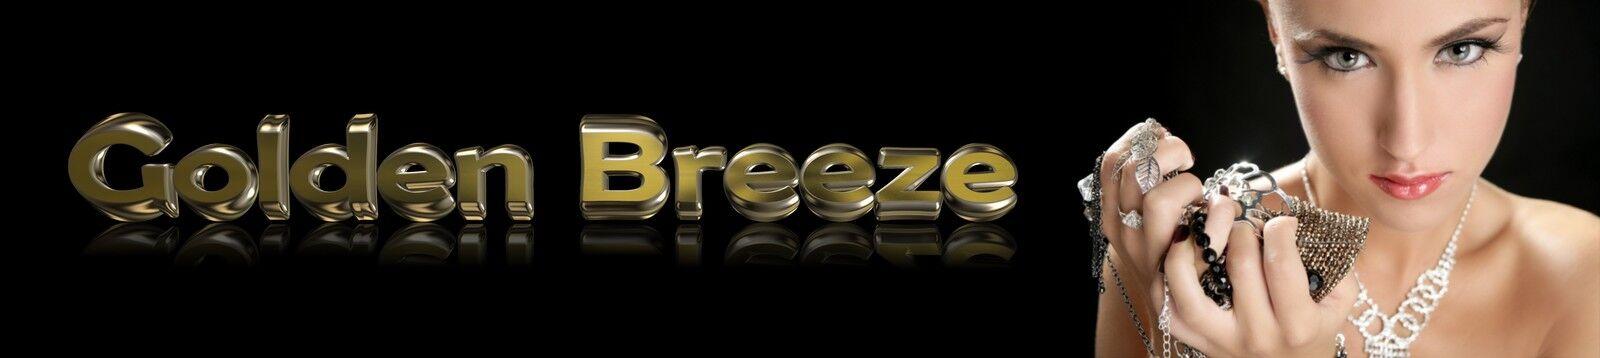 GOLDEN.BREEZE SHOP